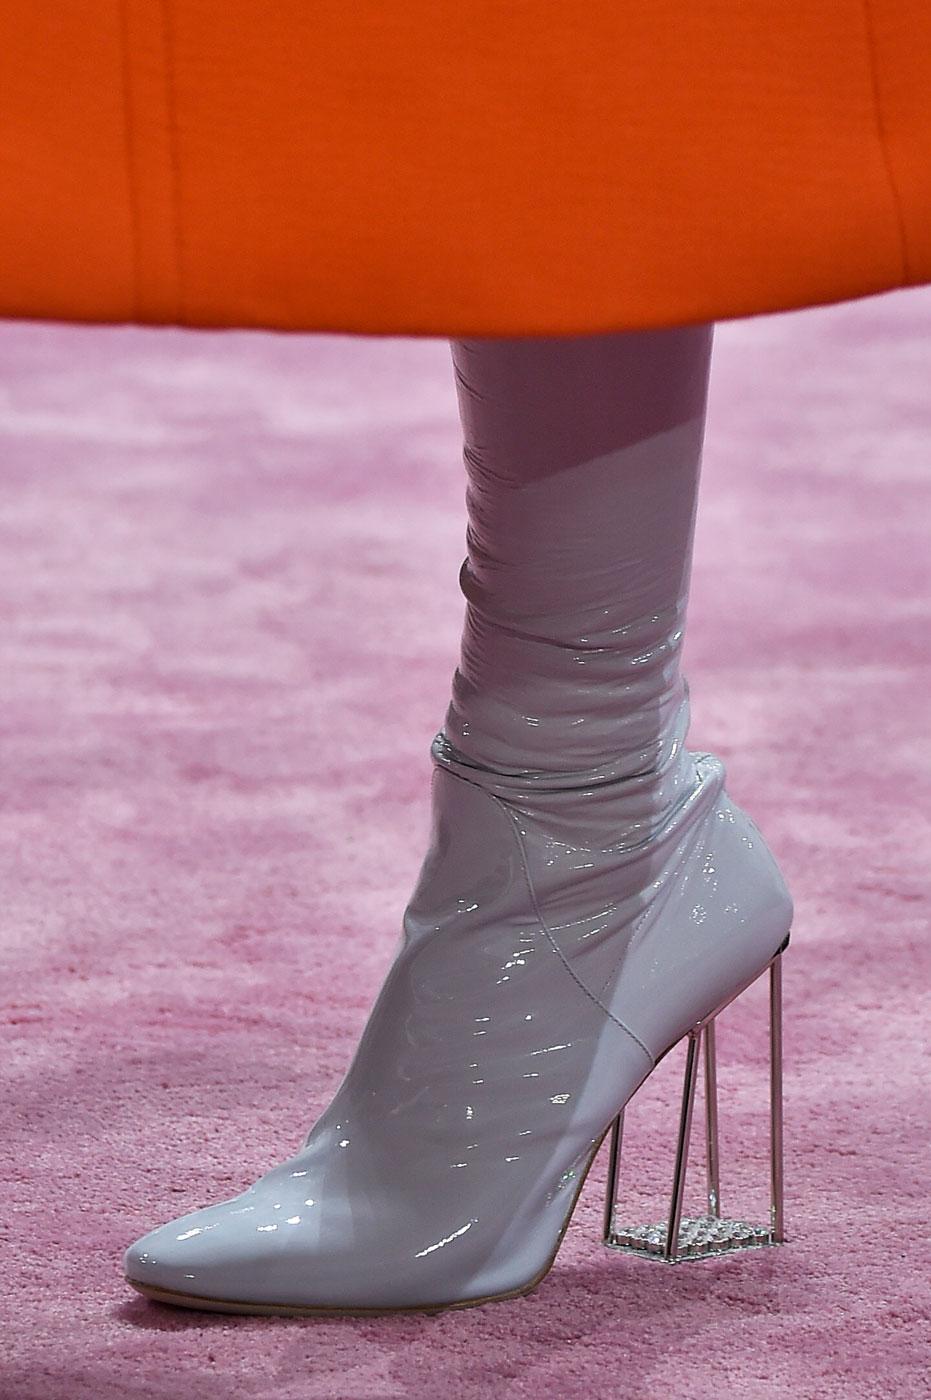 Christian-Dior-fashion-runway-show-close-ups-haute-couture-paris-spring-summer-2015-the-impression-178